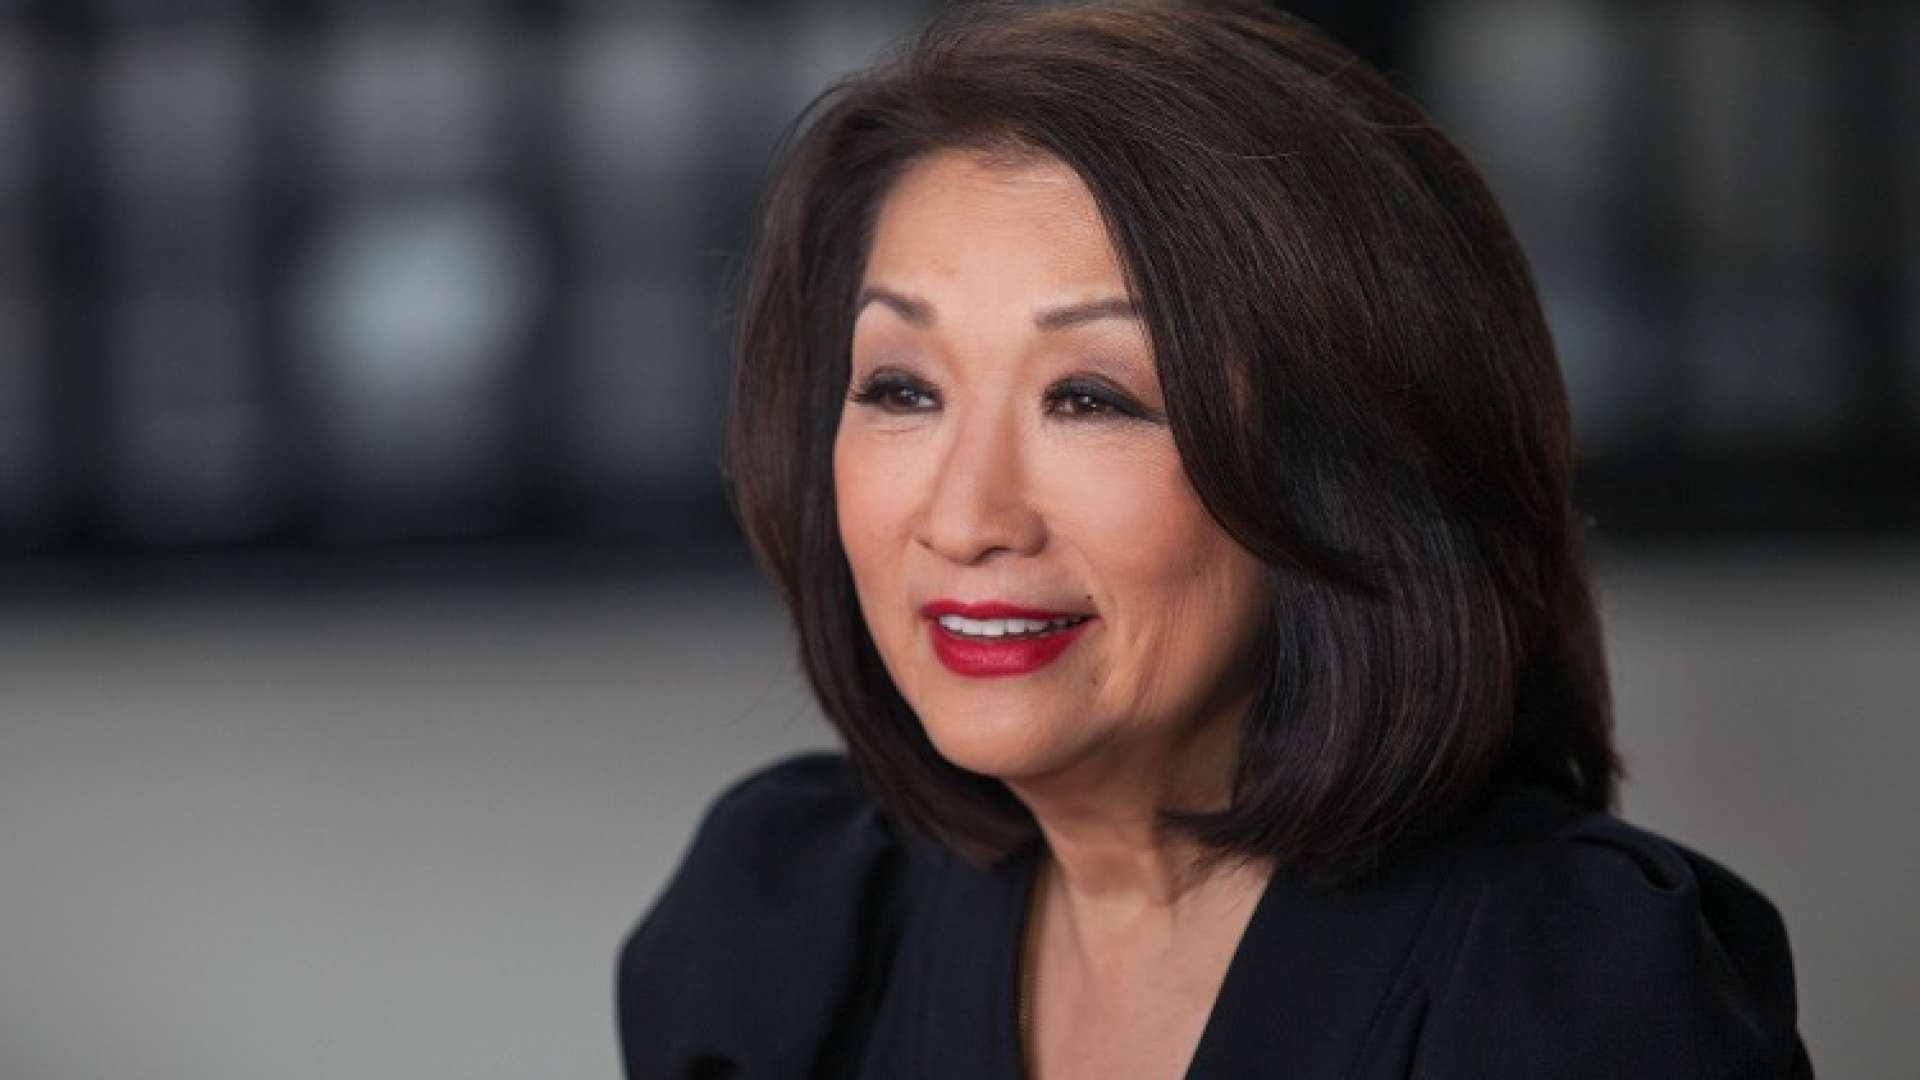 Connie Chung, Journalist